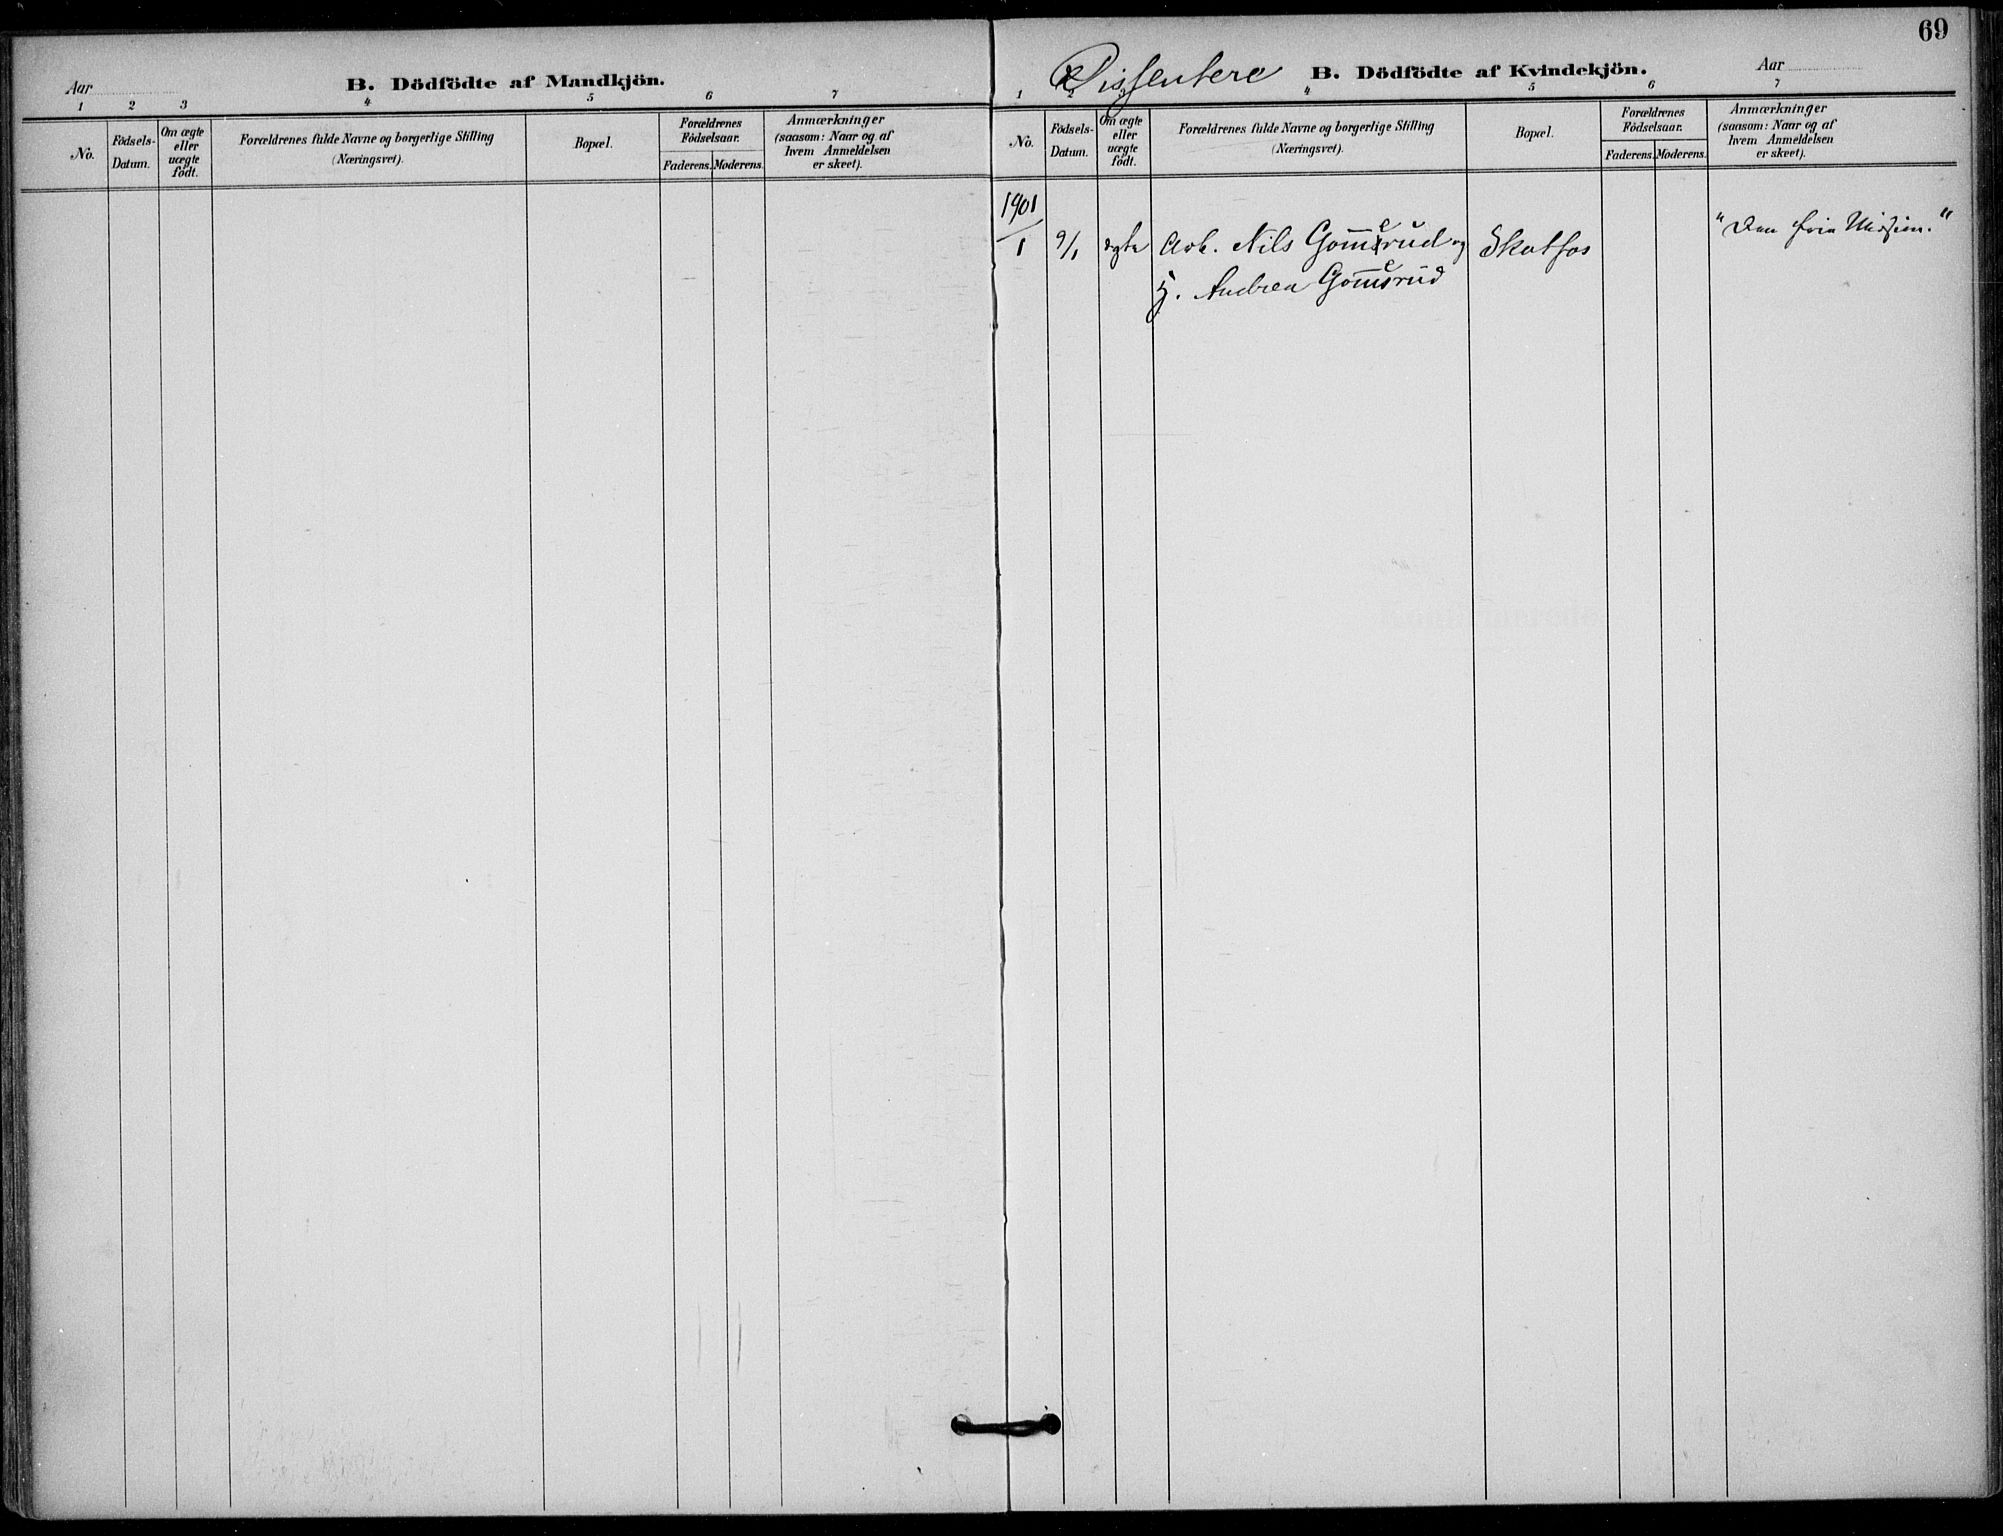 SAKO, Solum kirkebøker, F/Fb/L0002: Ministerialbok nr. II 2, 1893-1901, s. 69